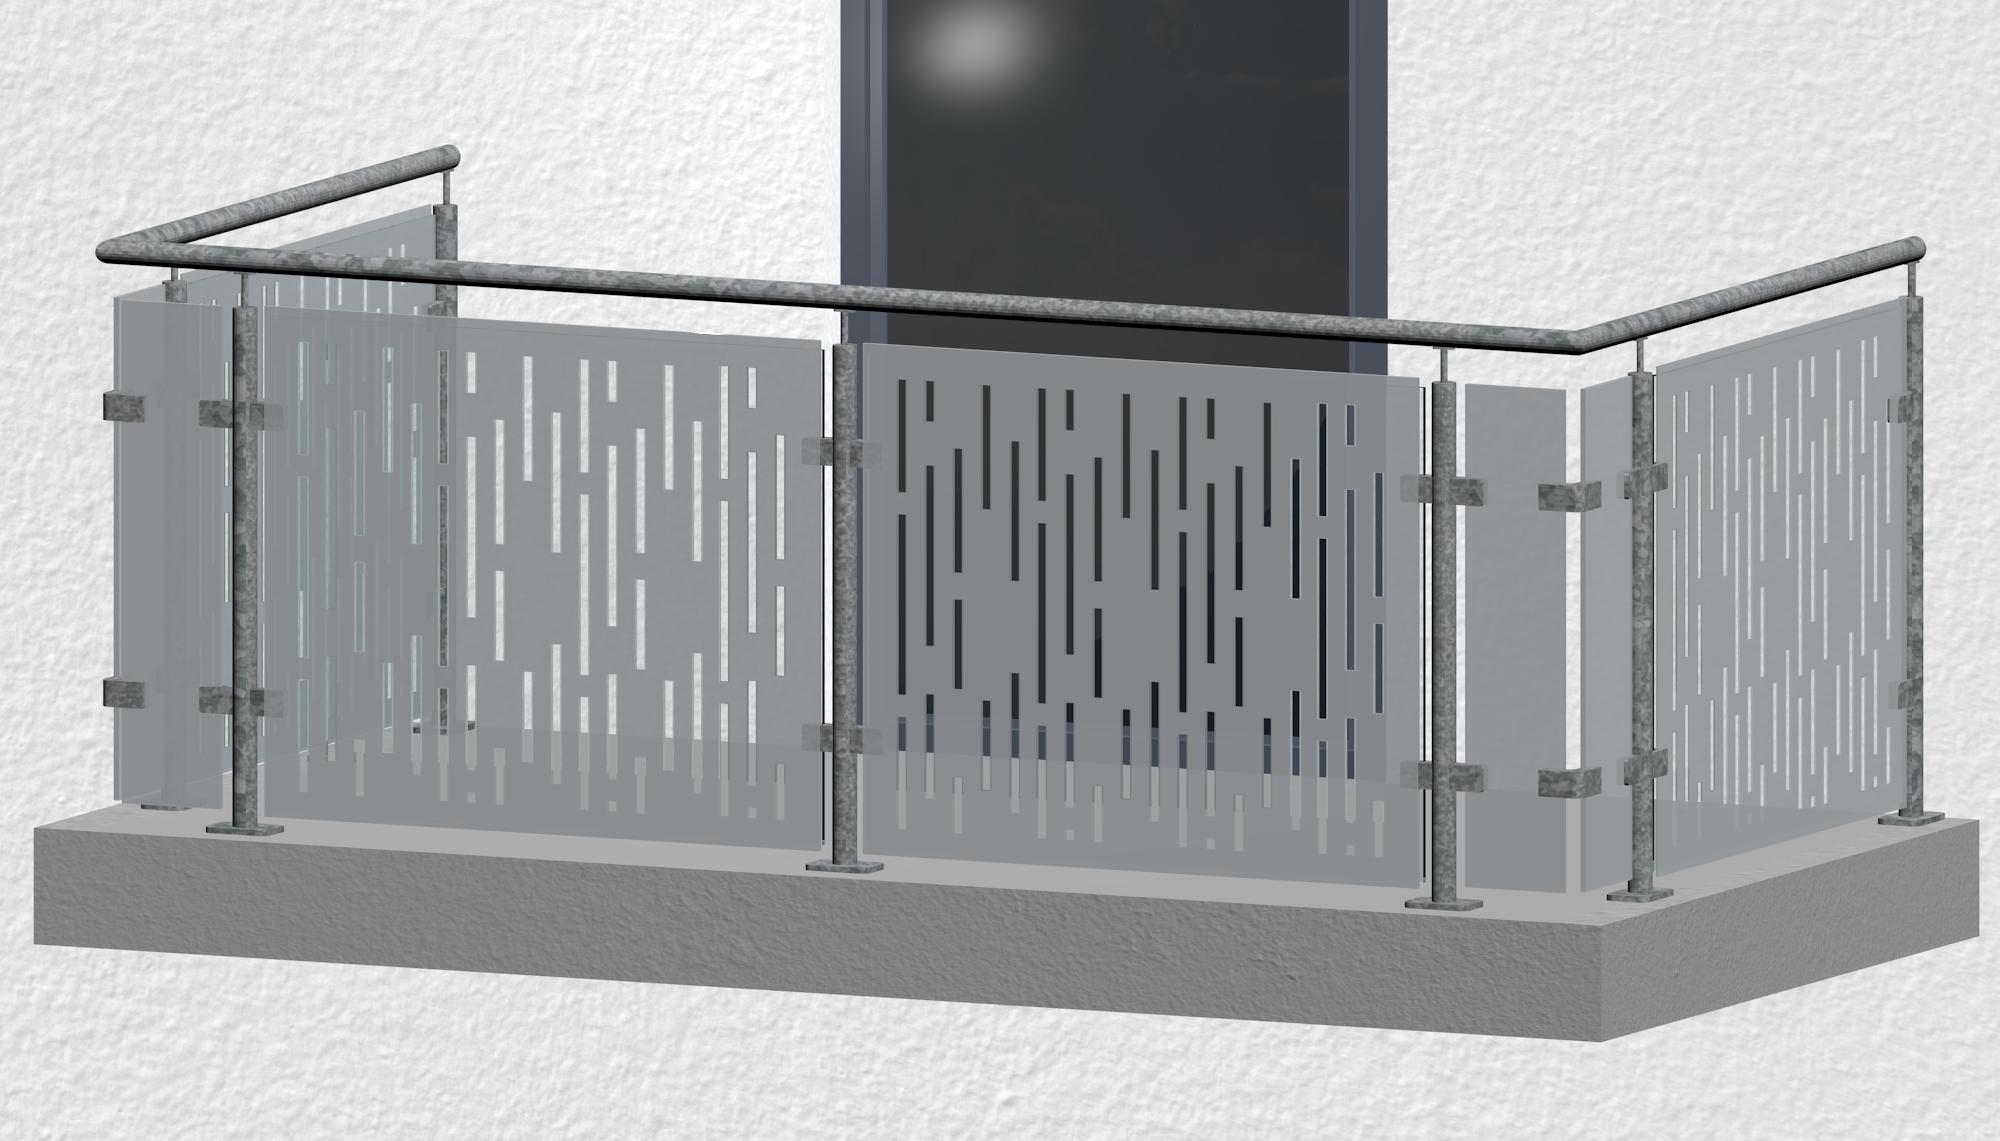 Balkongeländer verzinkt Designglas SF VE MO